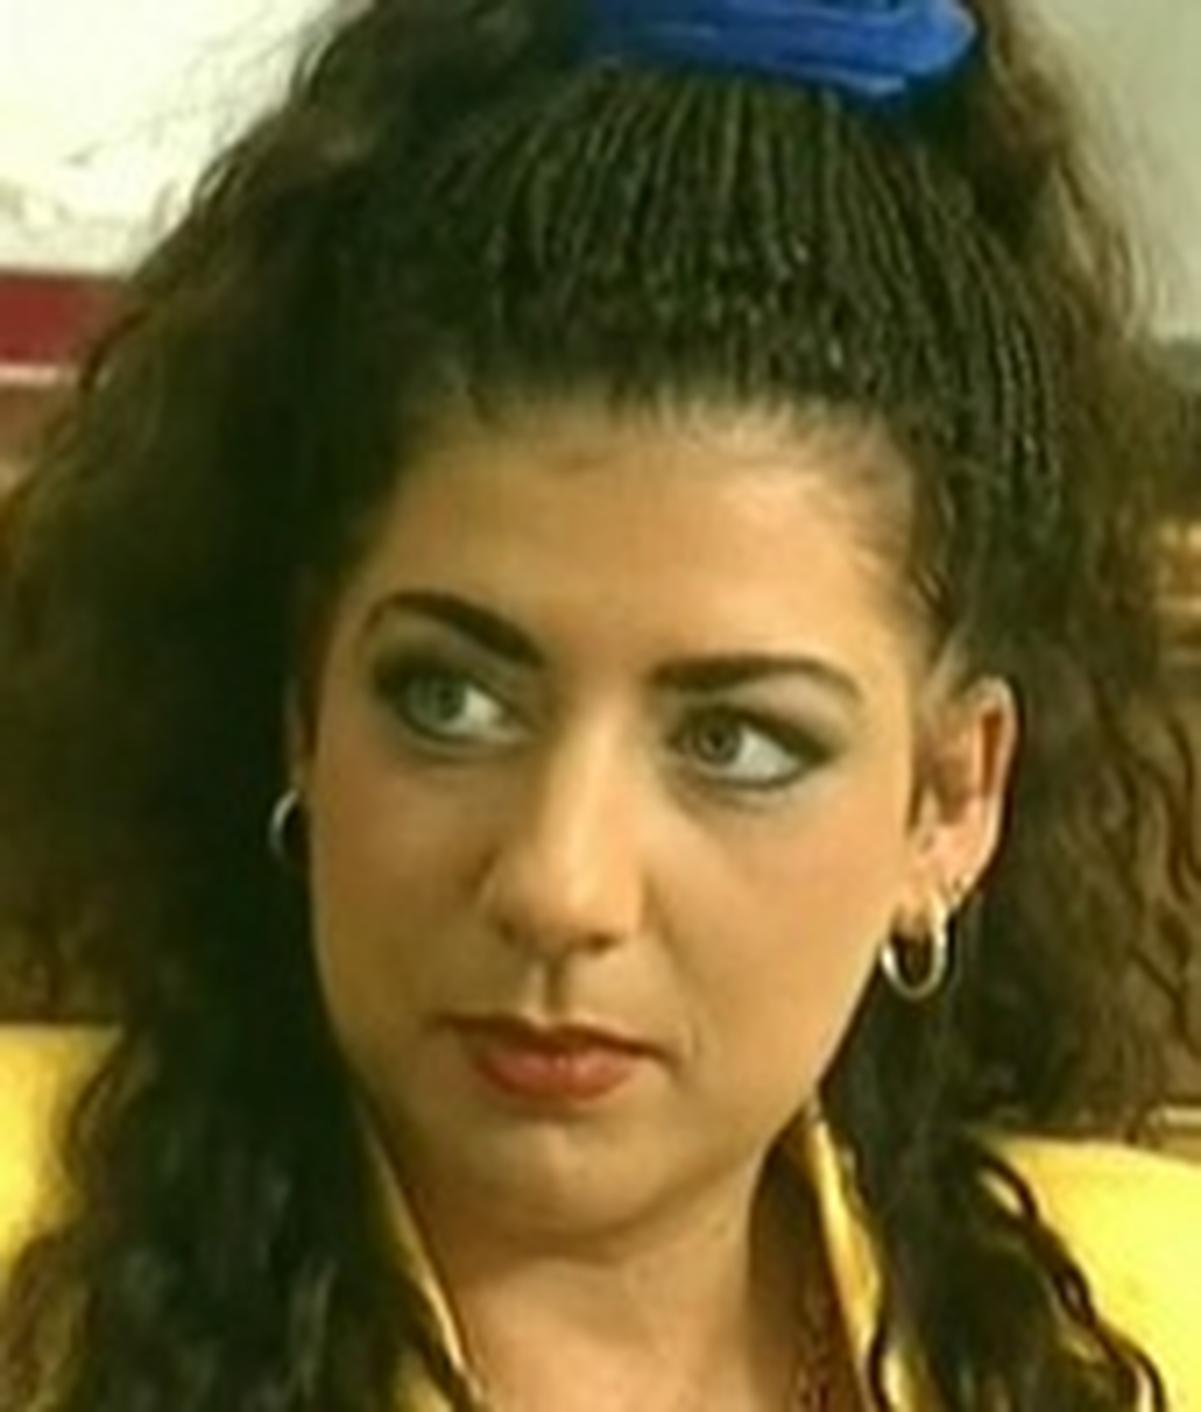 Gina Colani